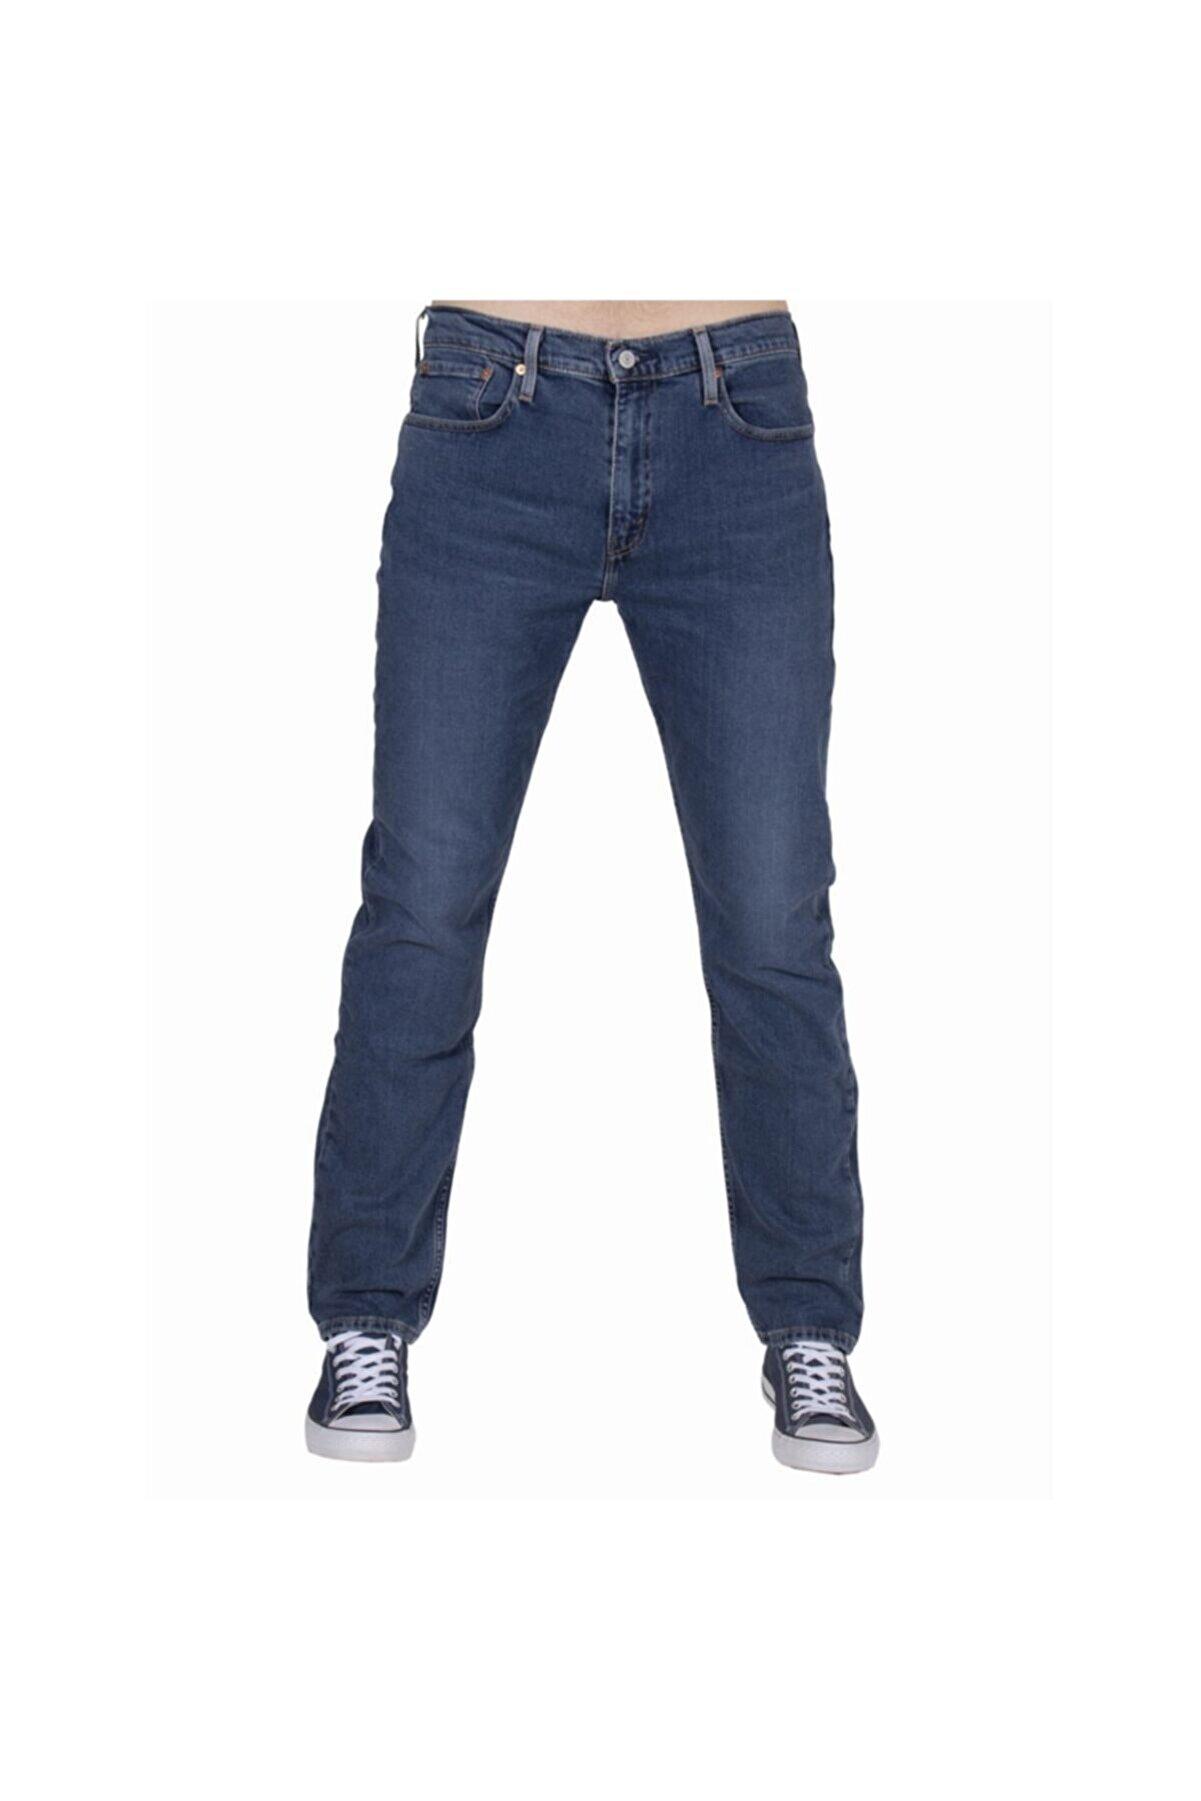 Levi's Erkek Jean Pantolon 502 Regular Taper 29507-0935